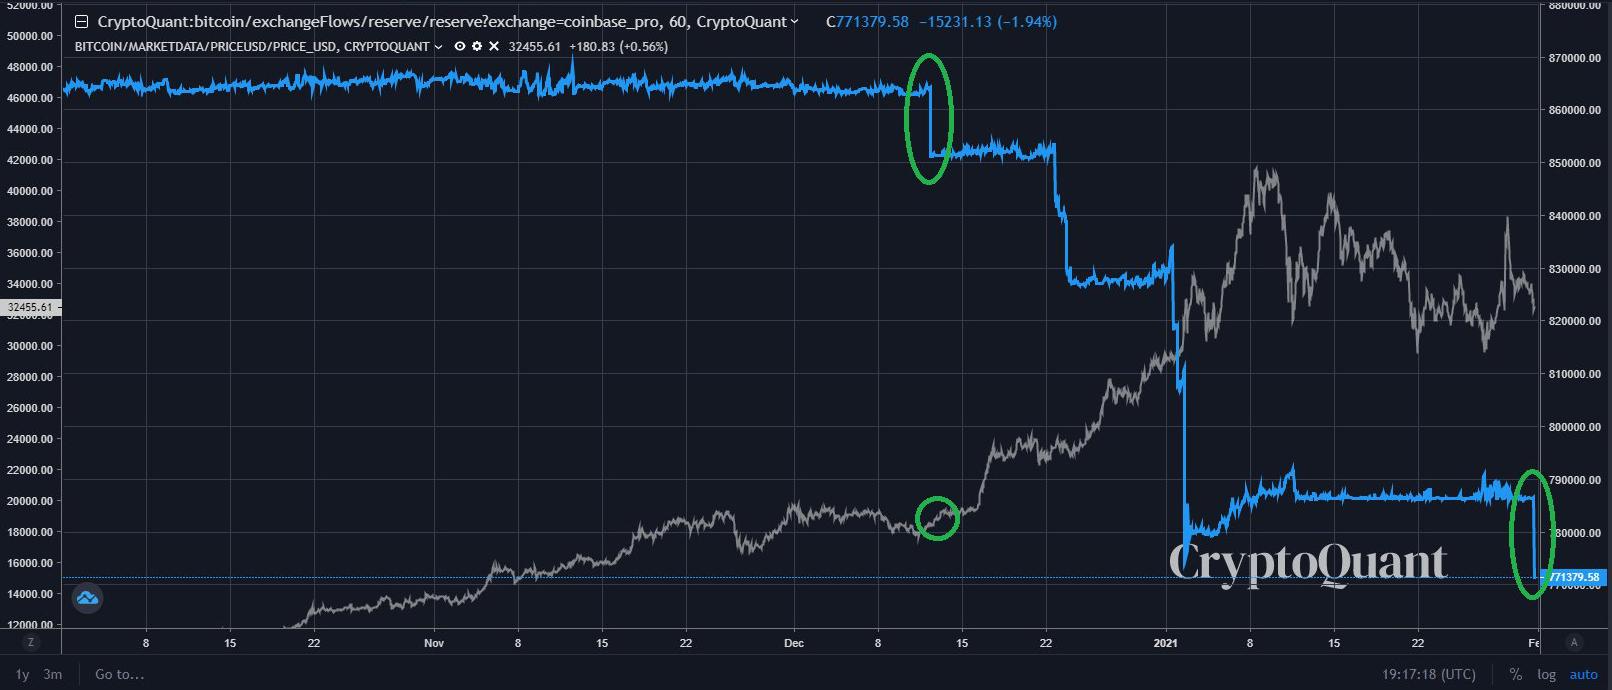 Bitcoin Coinbase withdrawals as of Jan 31 2021